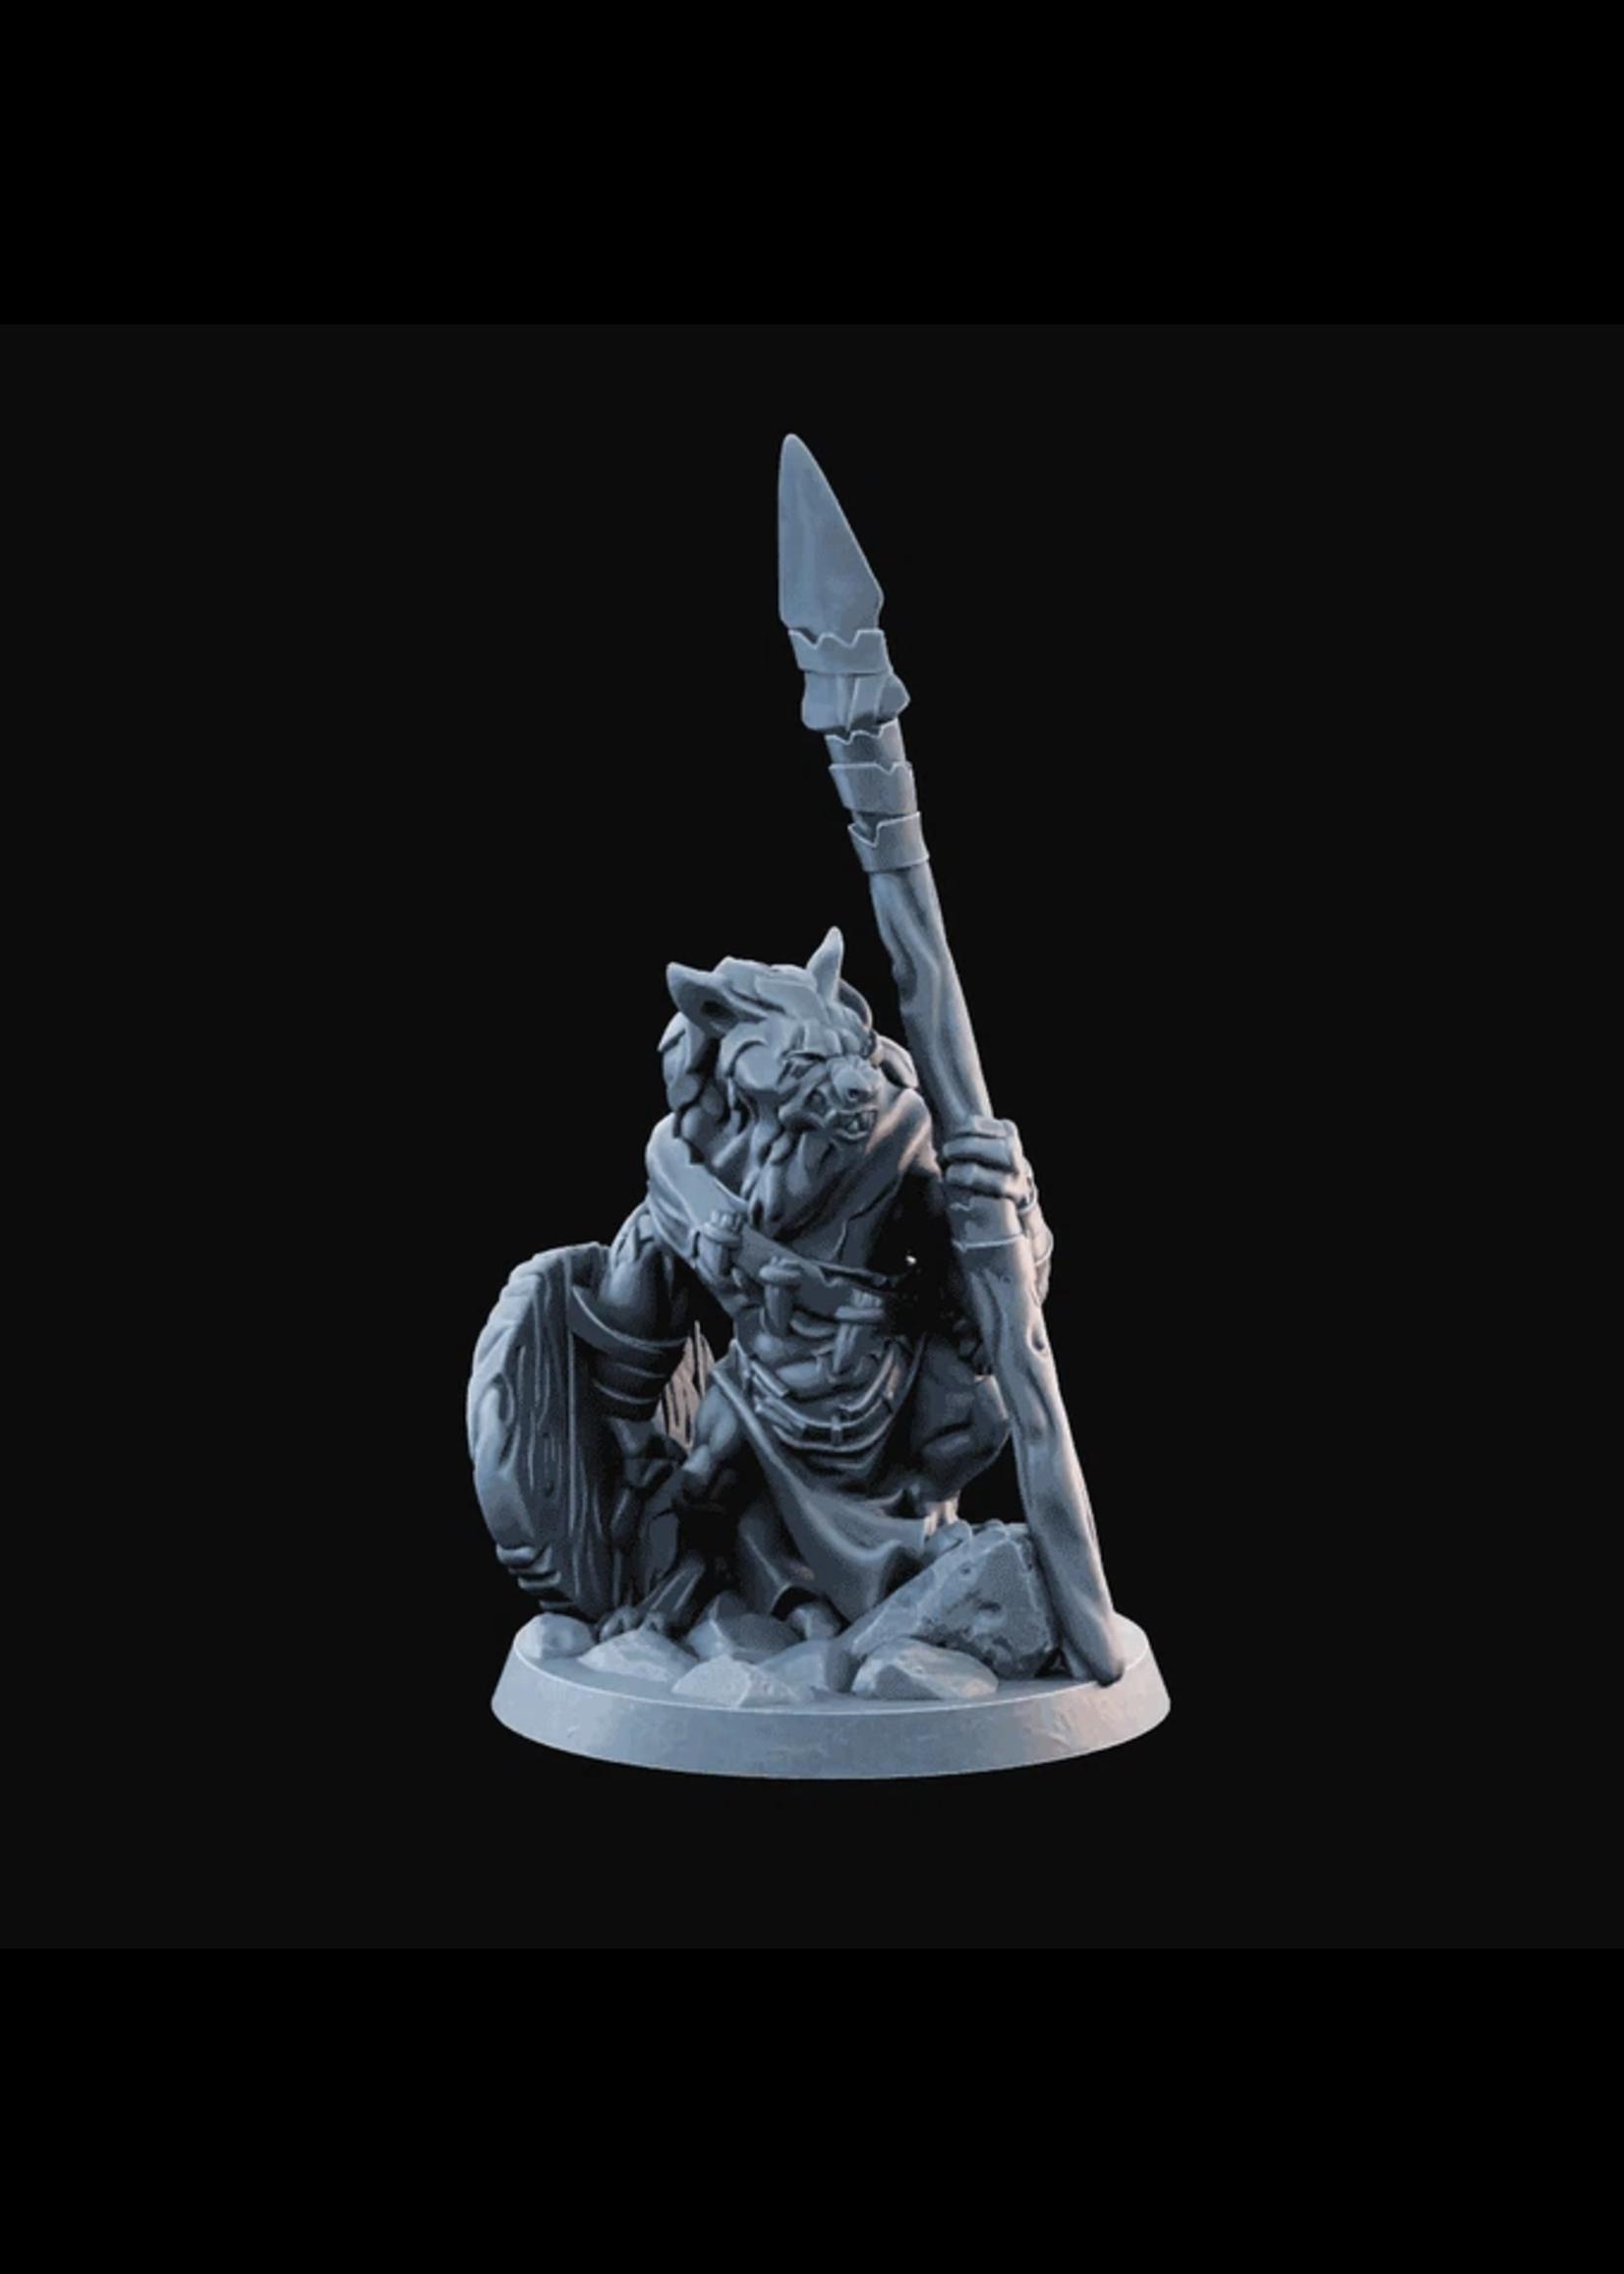 3D Printed Miniature - Hyenaman04  - Dungeons & Dragons - Desolate Plains KS